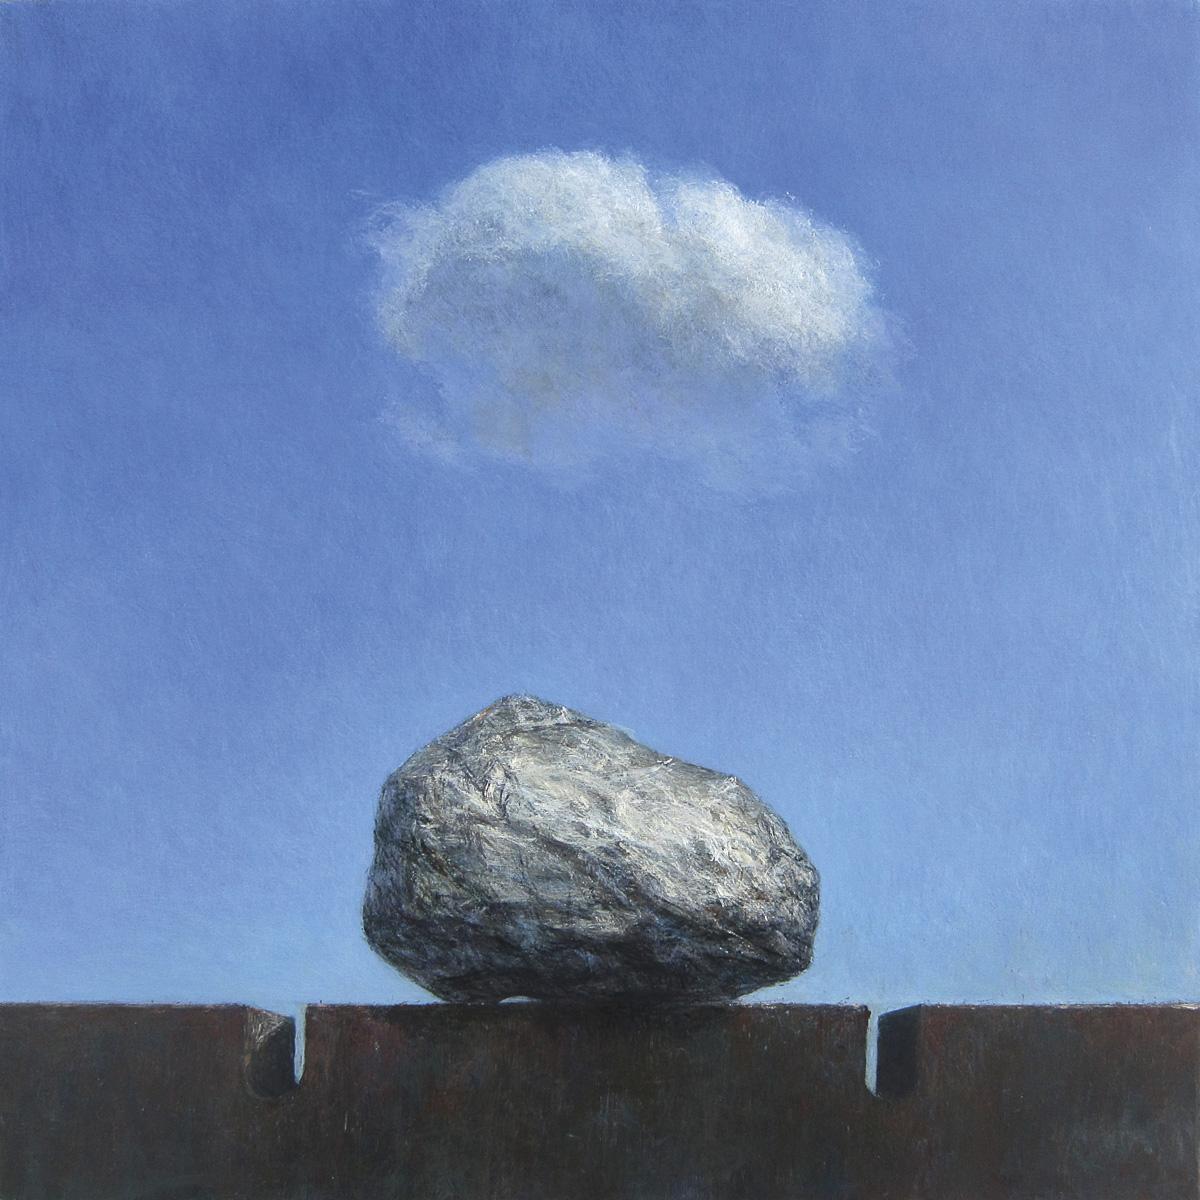 Arturo Picca, Pietra e nuvola (2021)